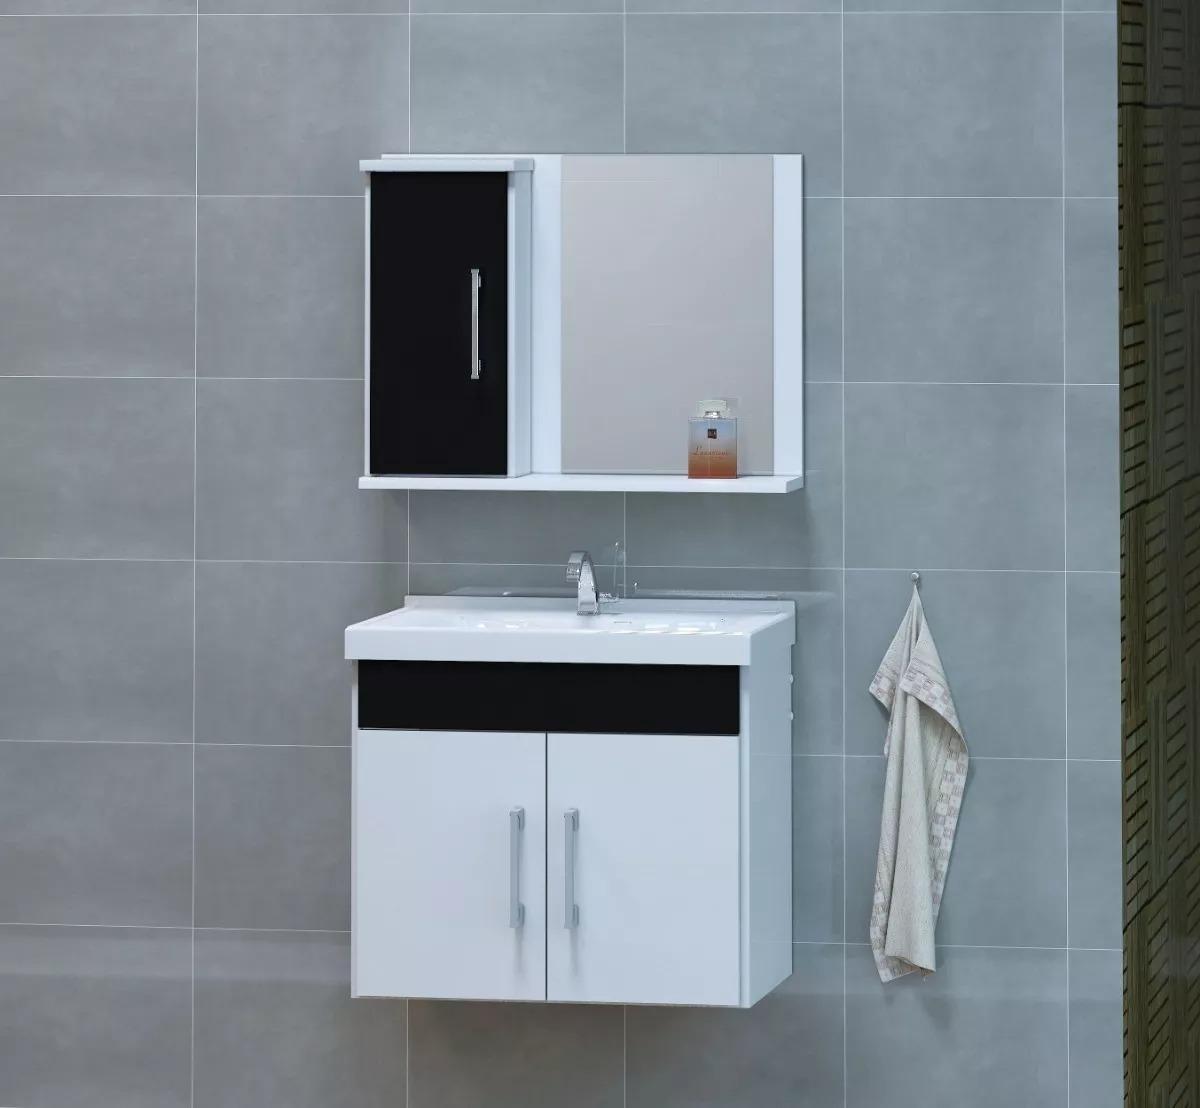 Kit Gabinete Dubai Banheiro Cuba Espelheira